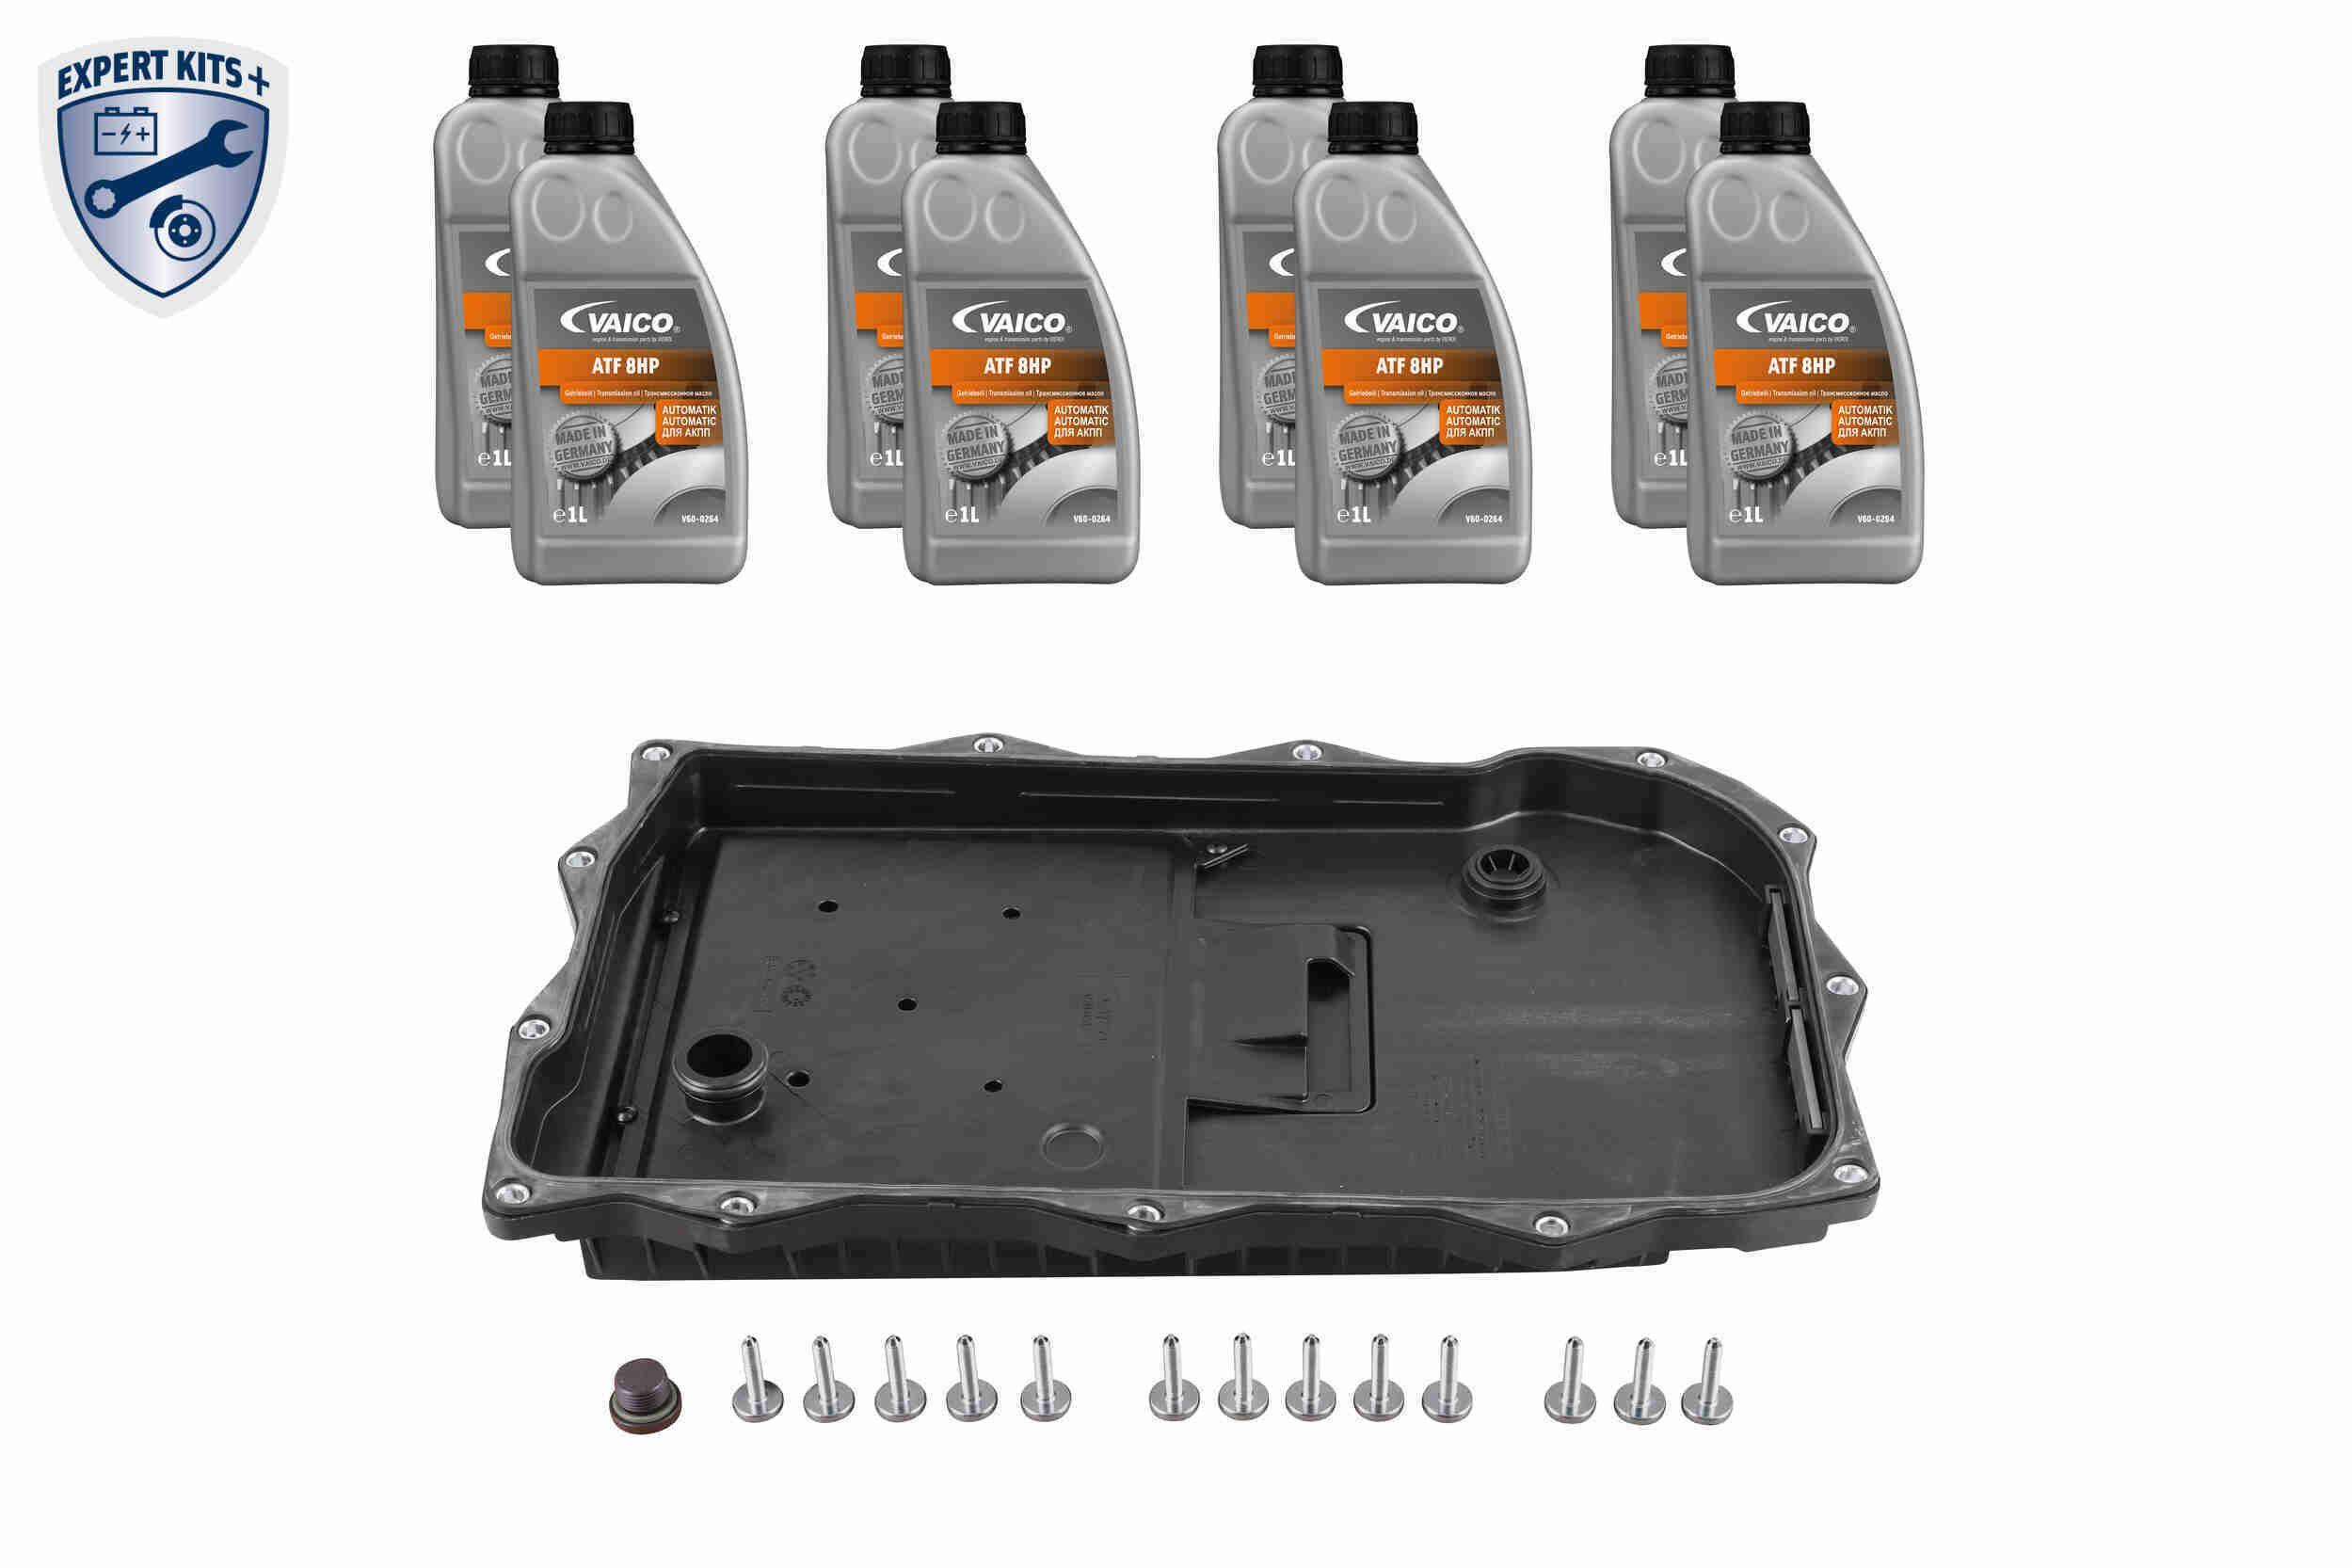 VAICO EXPERT KITS + Parts Kit, automatic transmission oil change